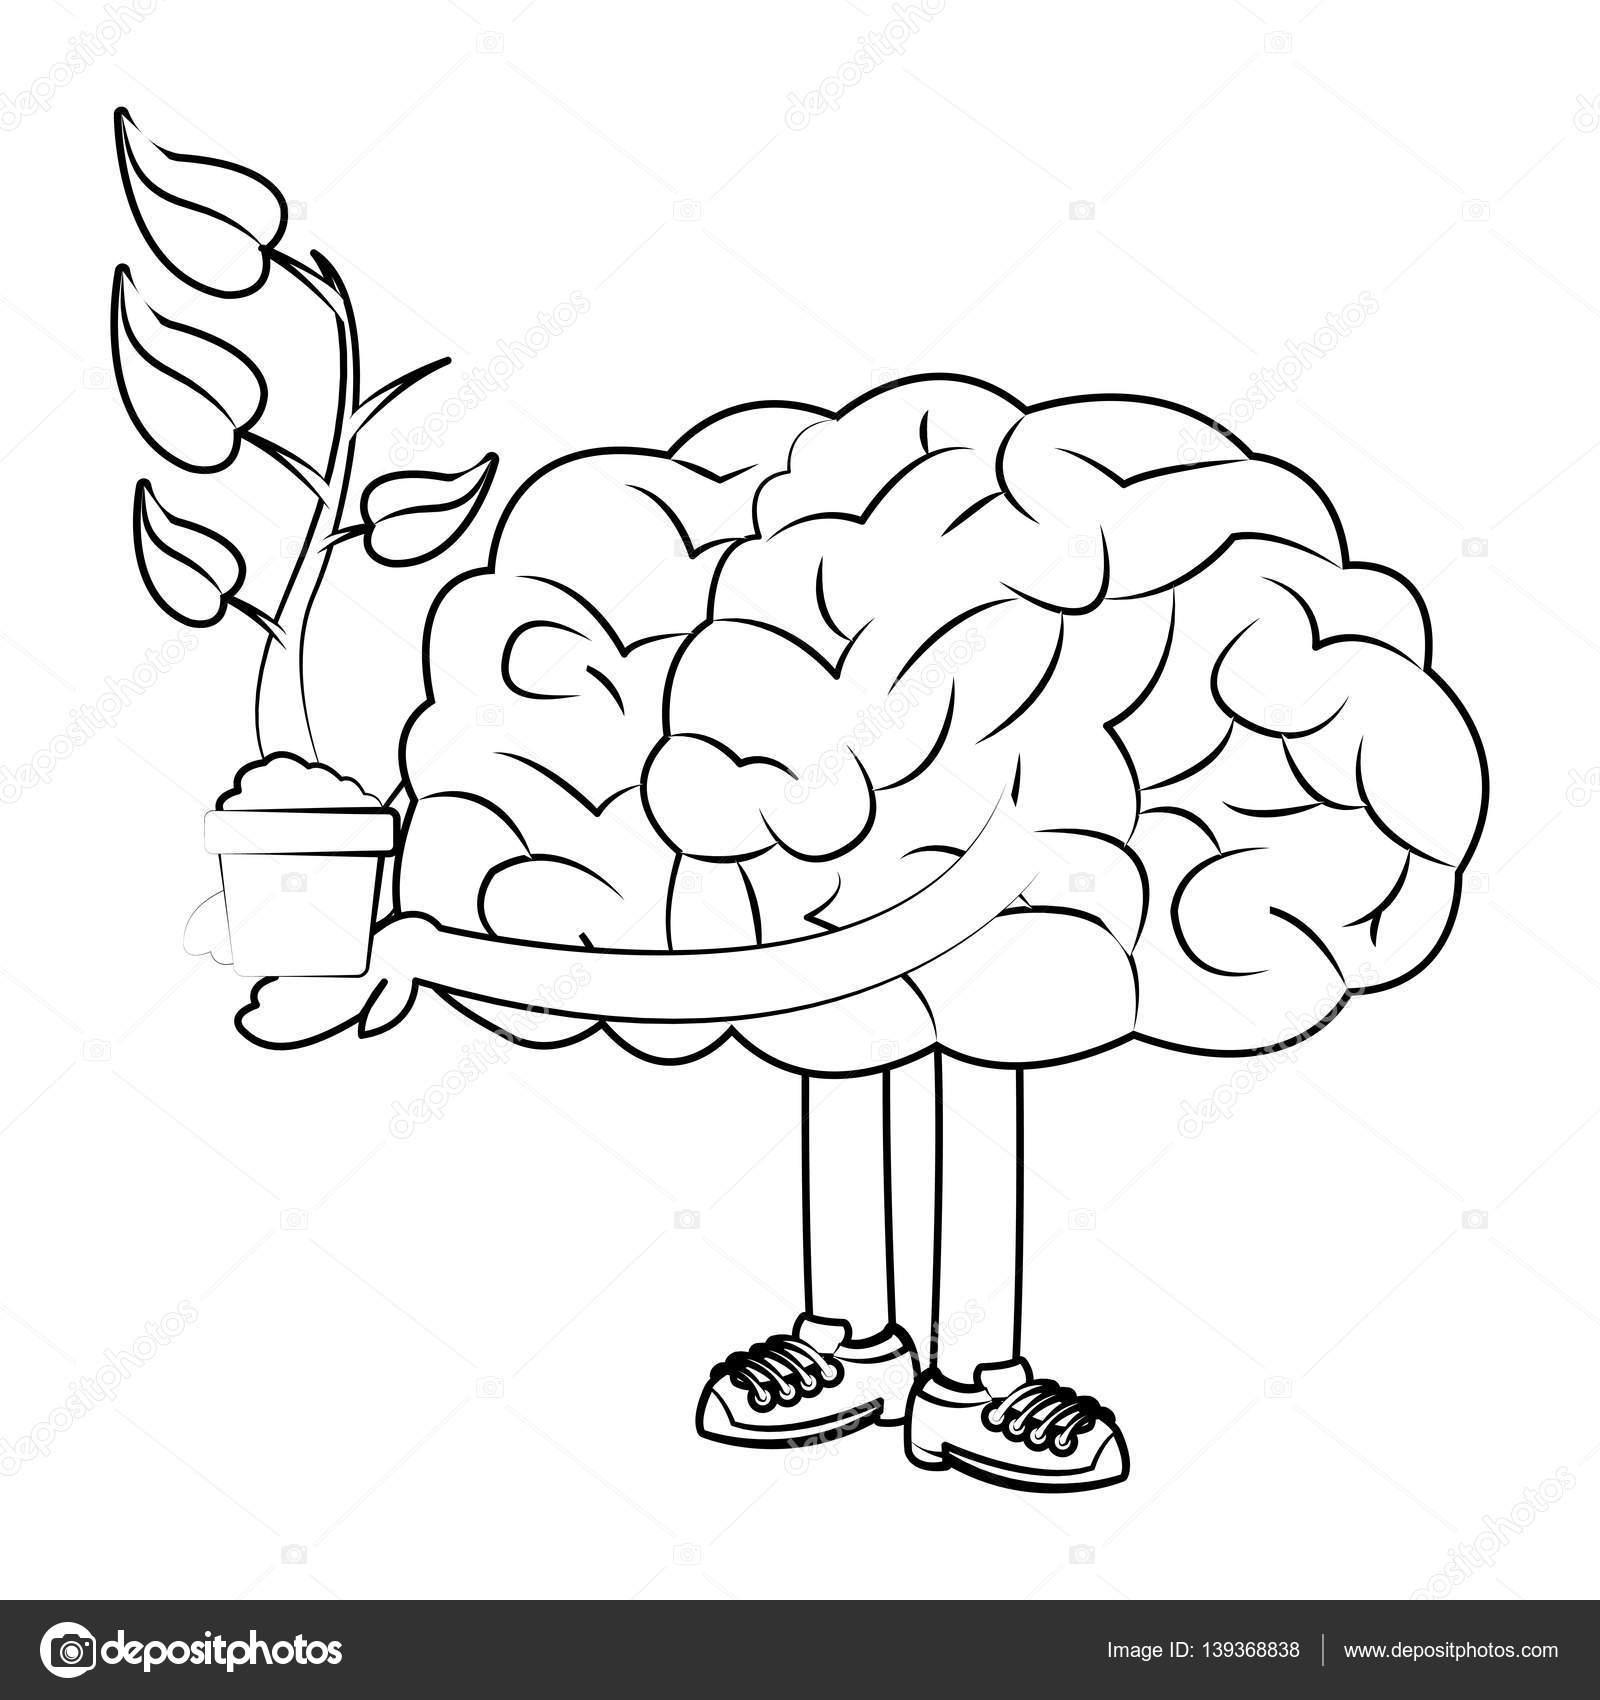 Human Brain Design Stock Vector C Jemastock 139368838